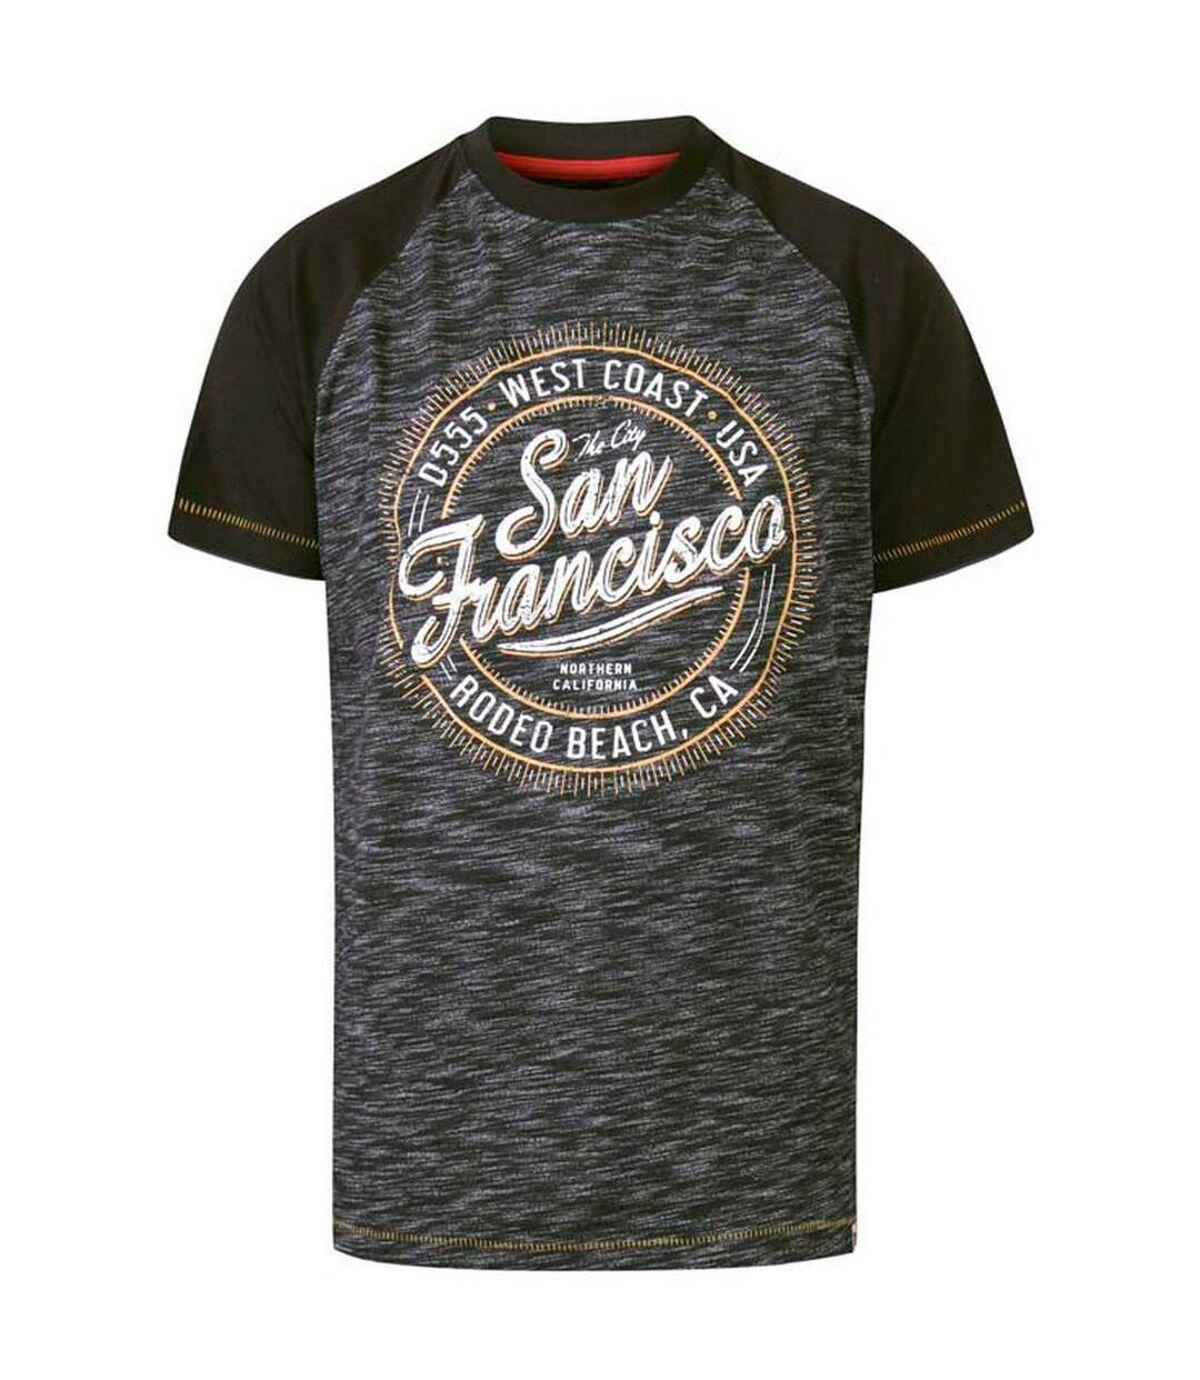 Duke Mens Sunderland D555 San Francisco Raglan T-Shirt (Black Reno) - UTDC289